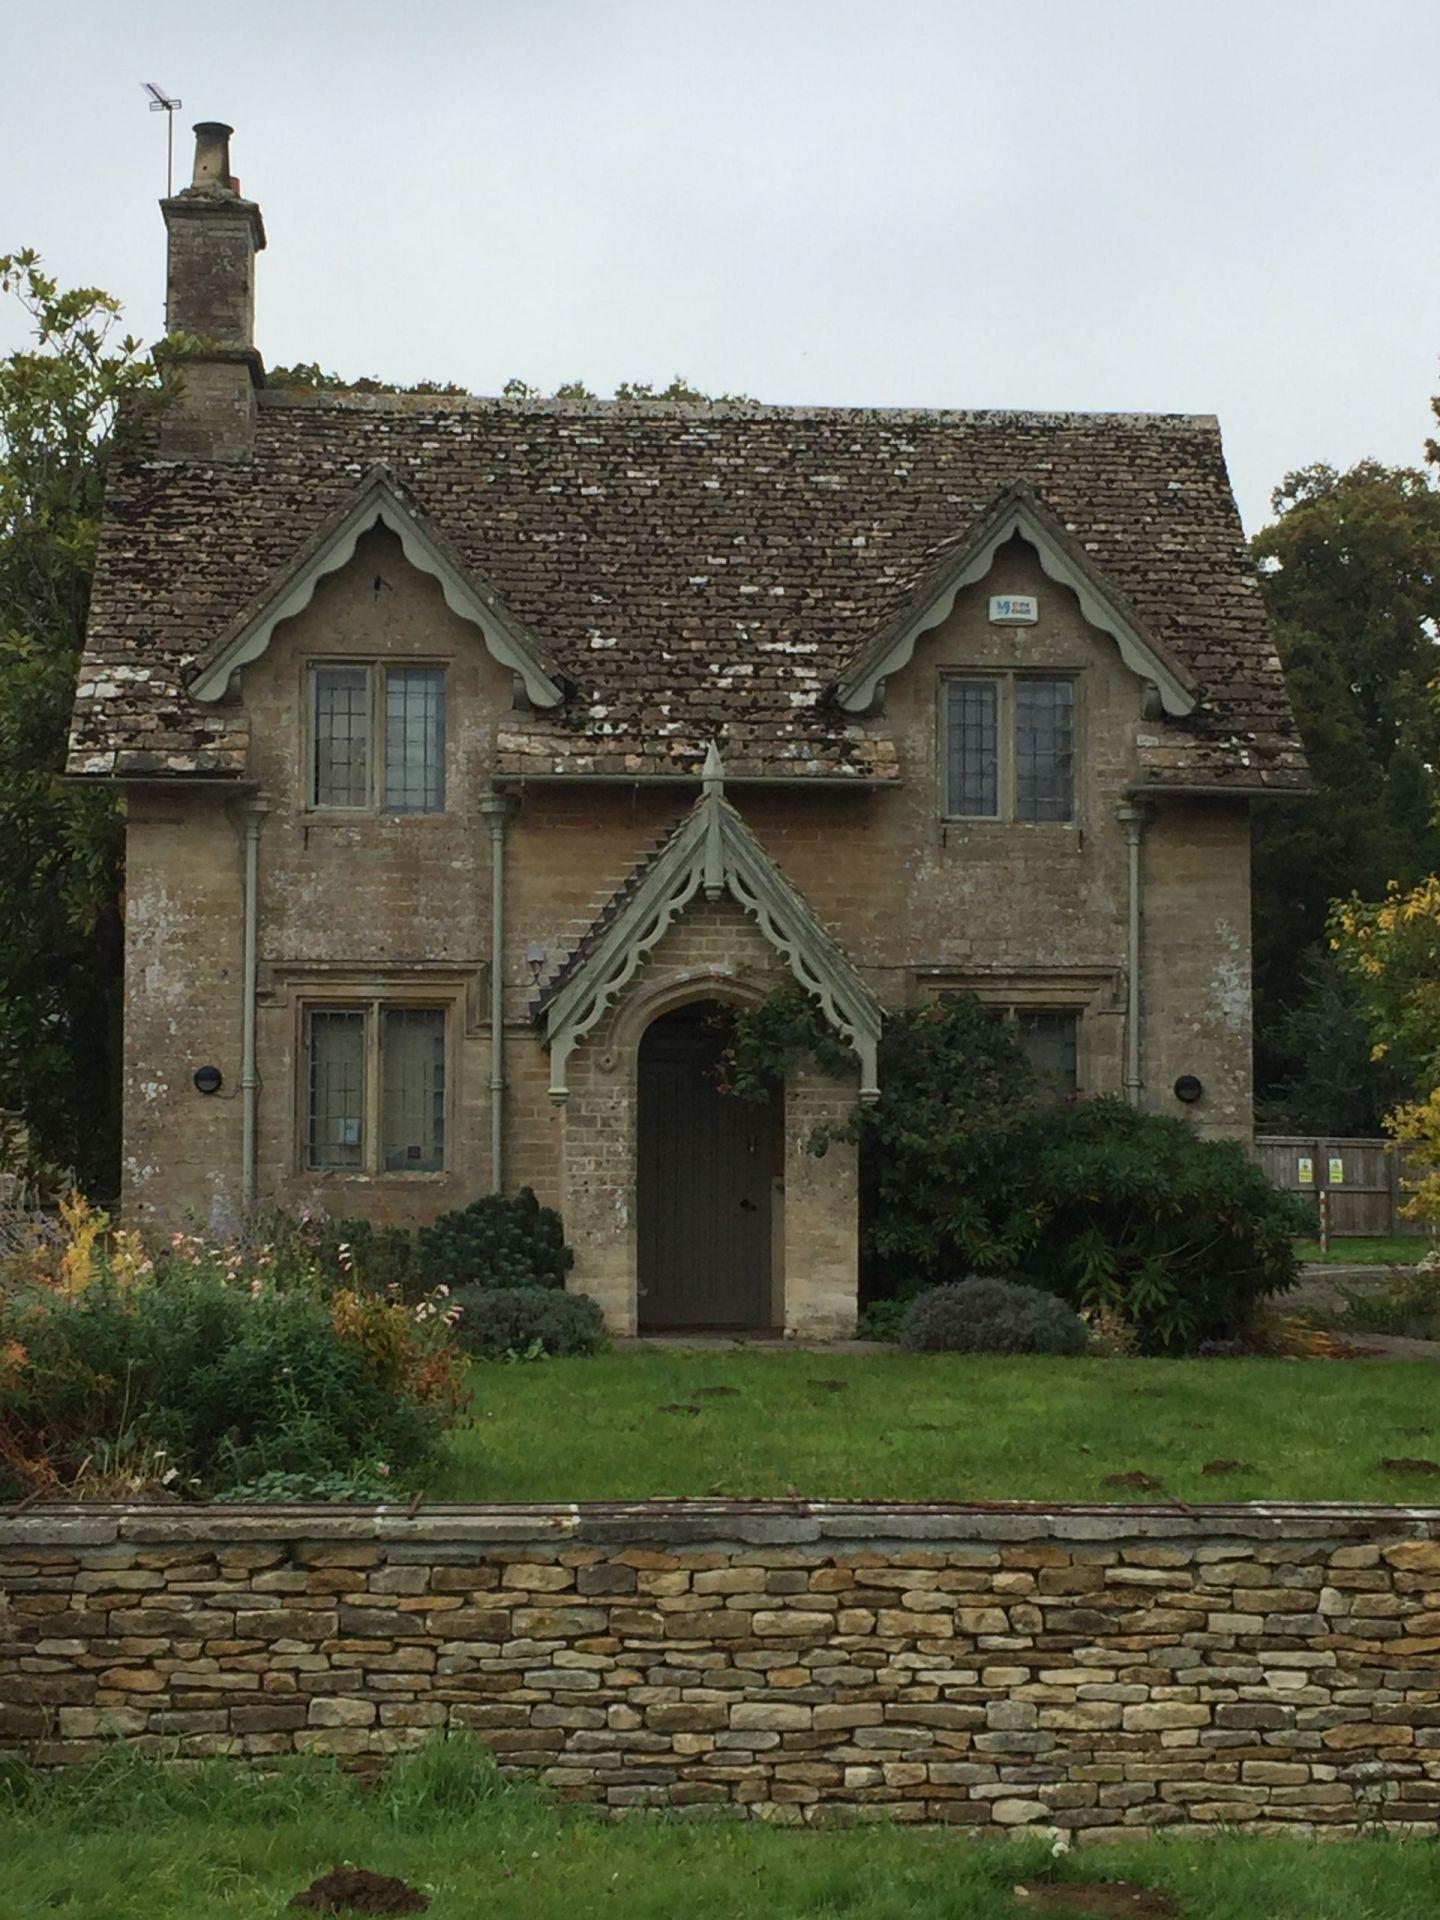 House at Westonbirt Arboretum